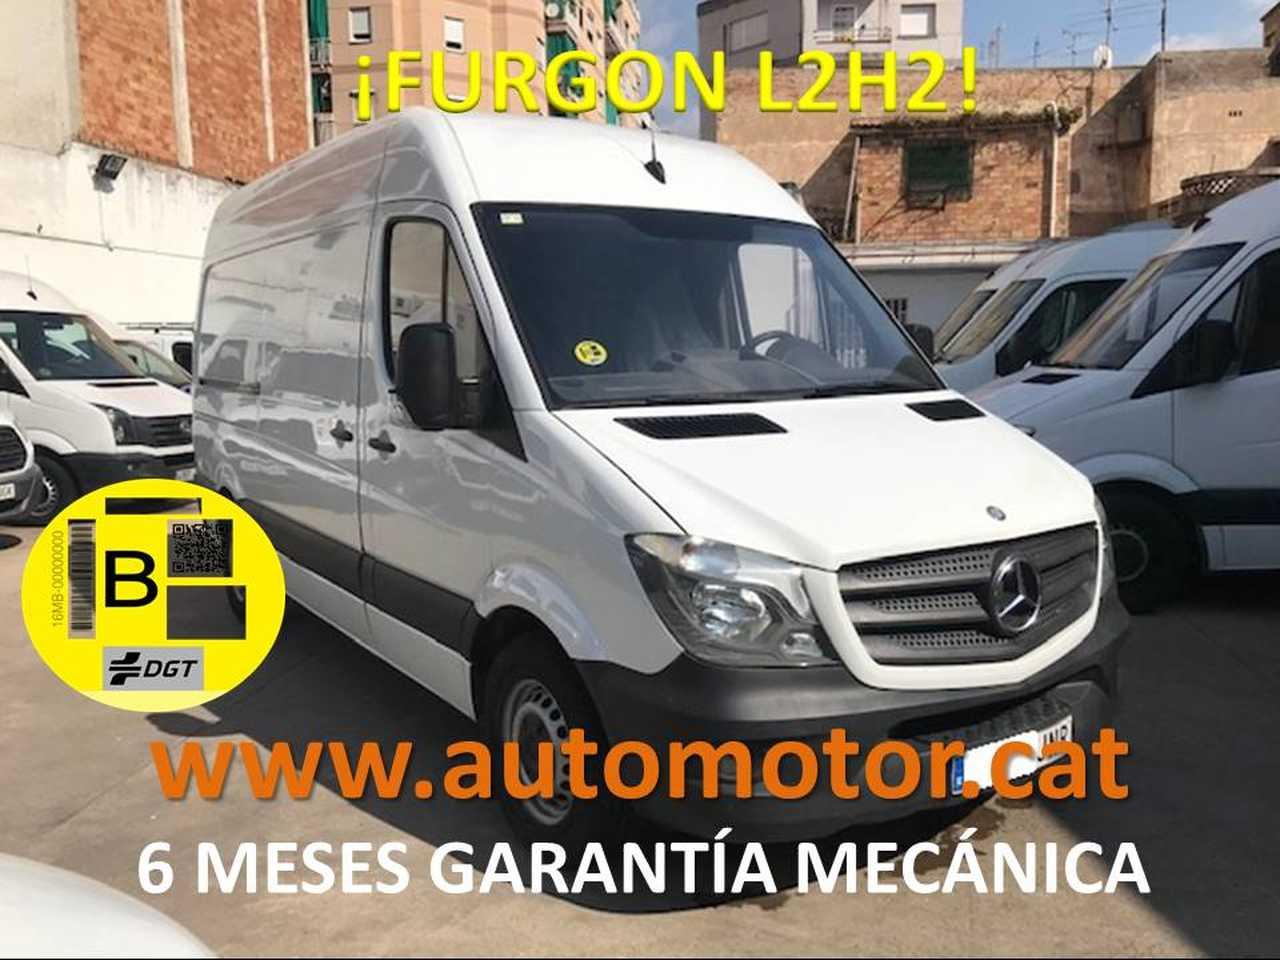 Mercedes Sprinter Furgón 310CDI Medio T.E. - GARANTIA MECANICA  - Foto 1